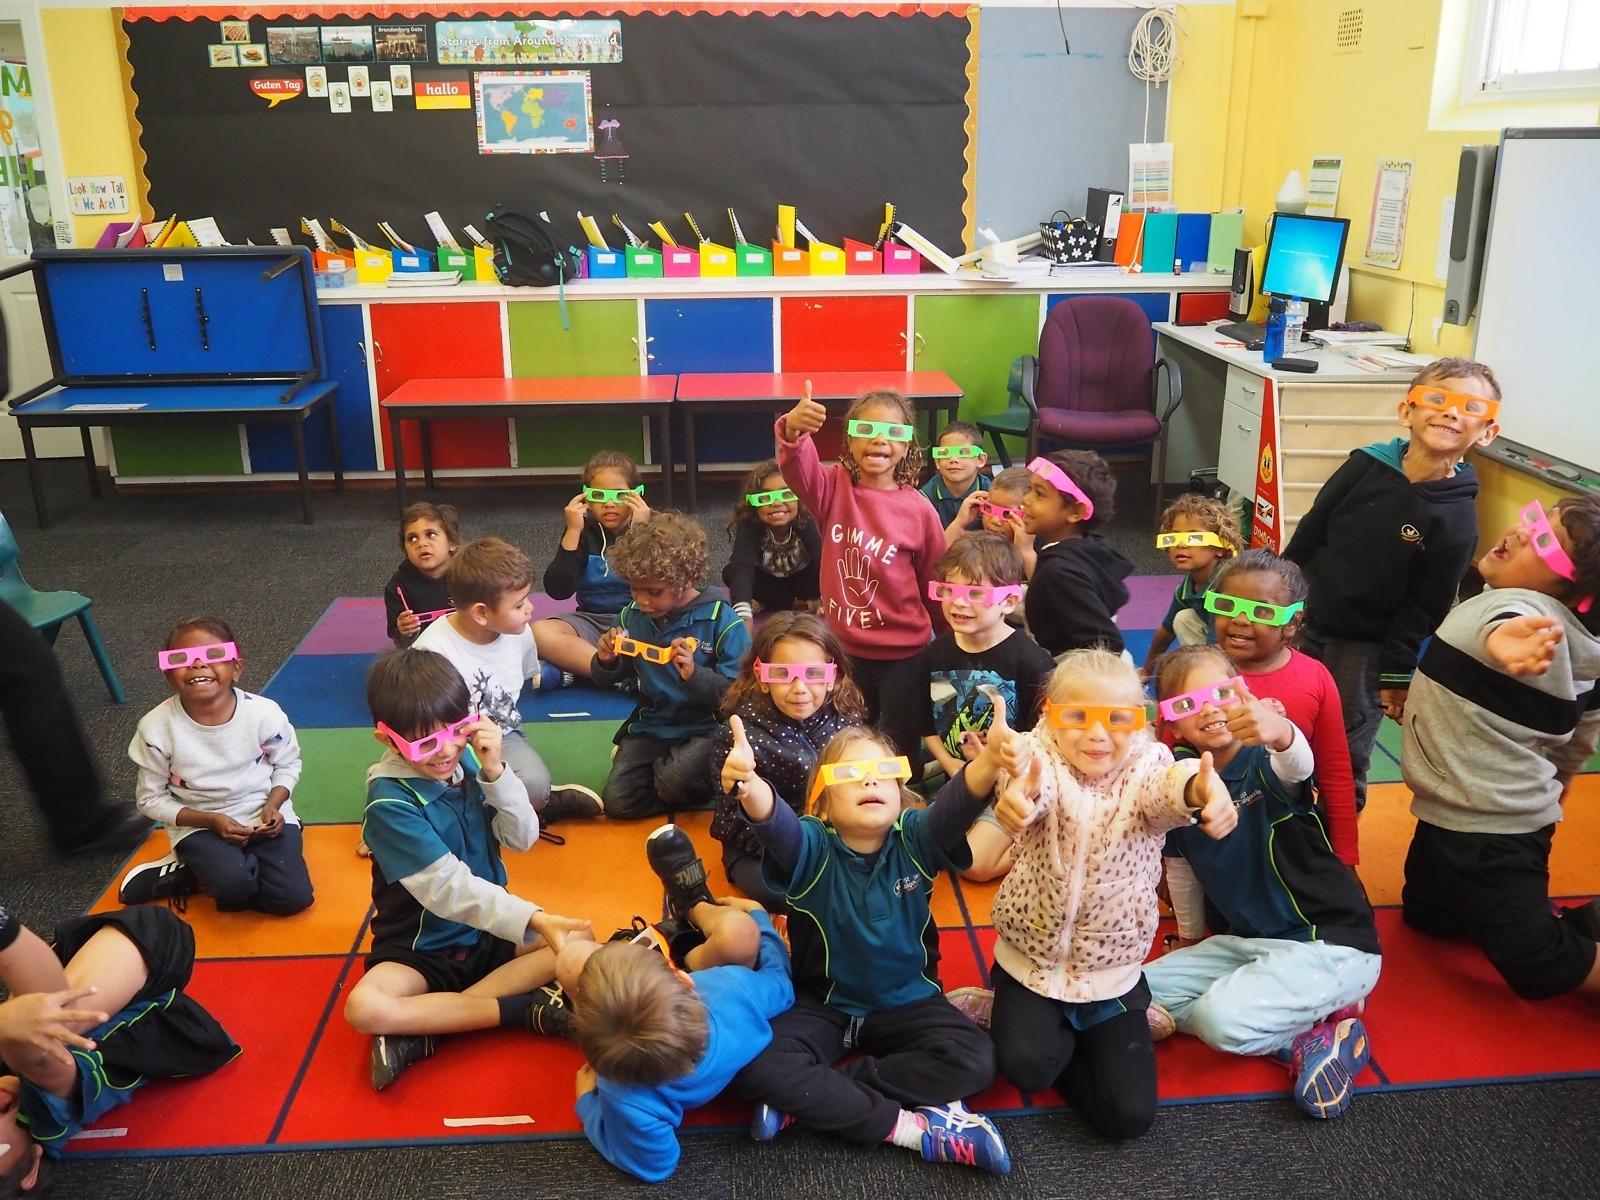 Students from East Kalgoorlie Primary School